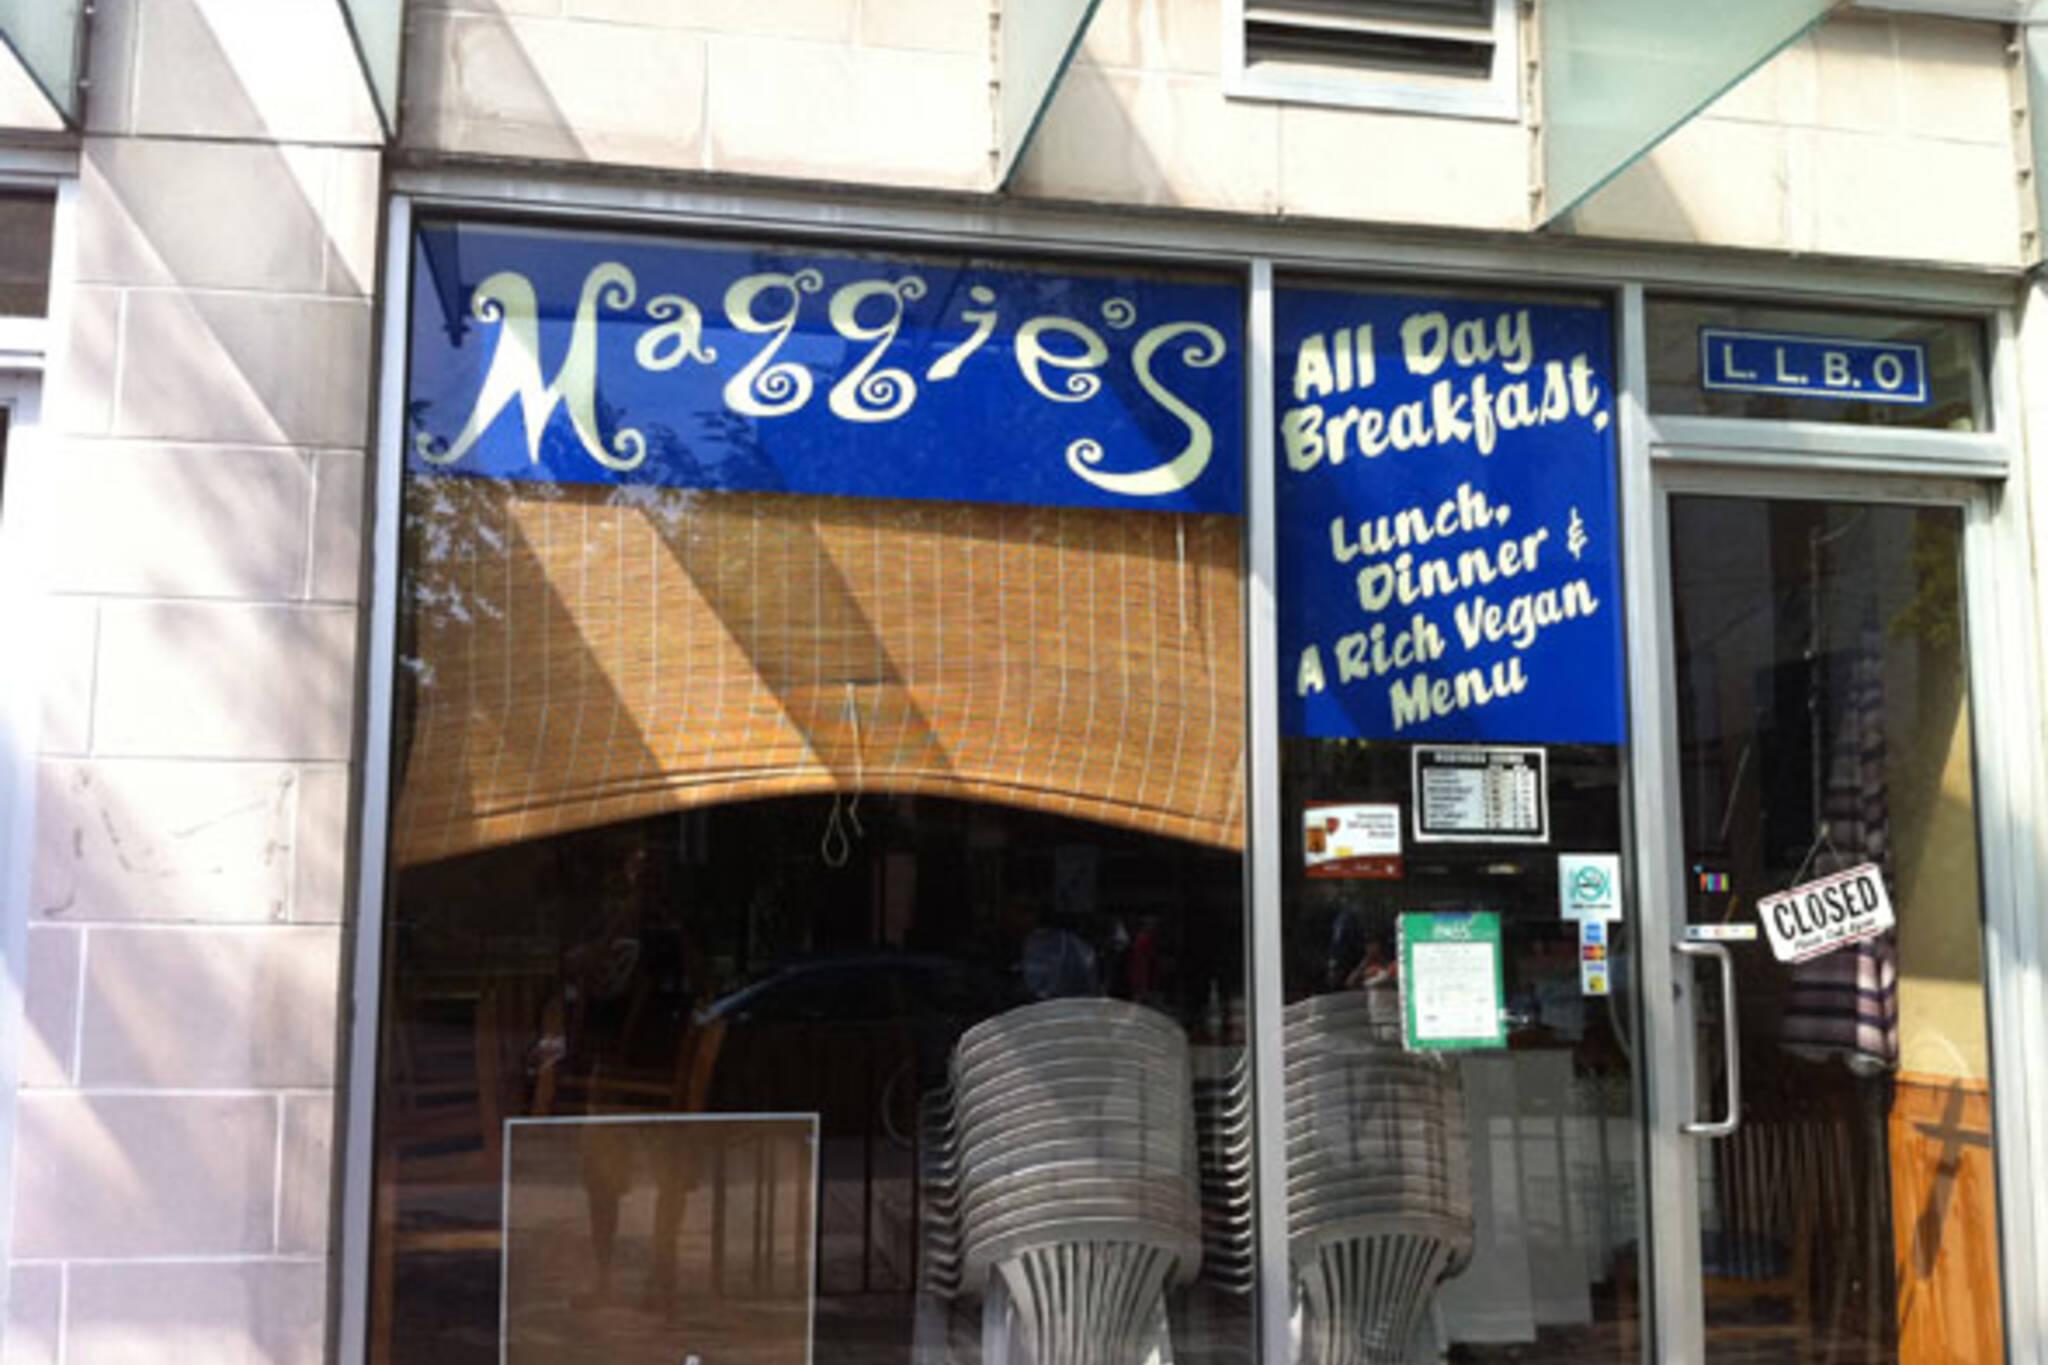 Maggie's Charles St. Toronto